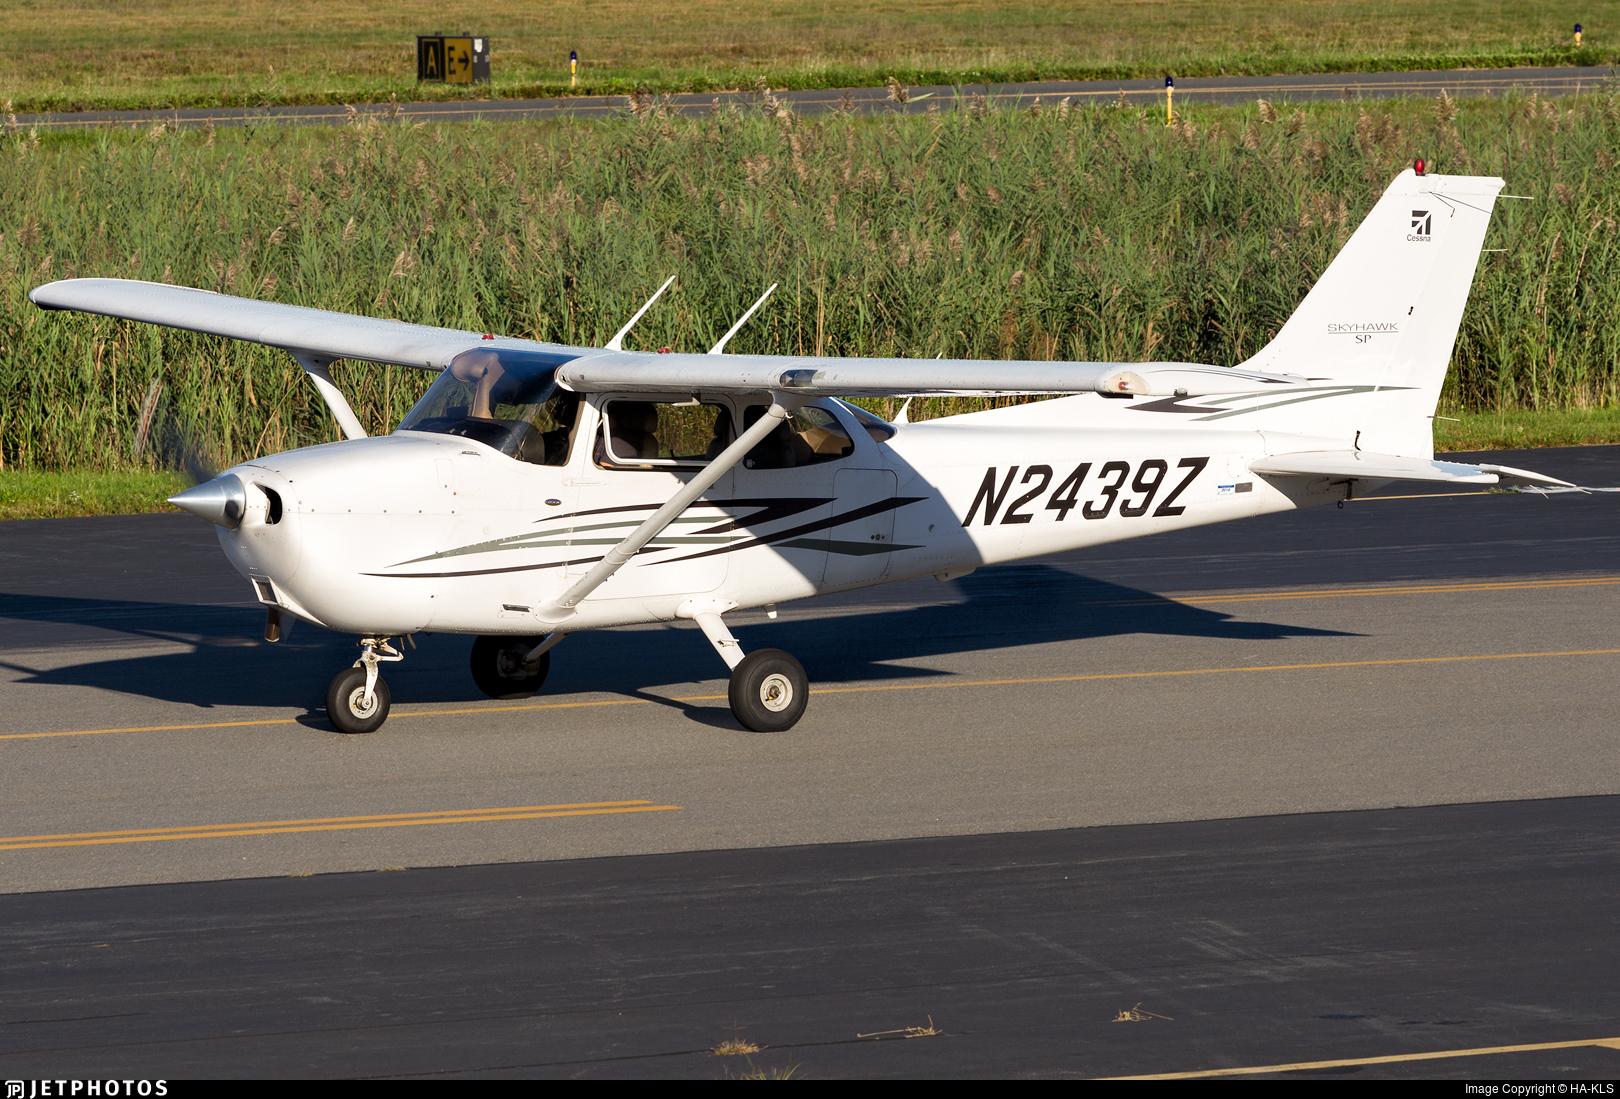 N2439Z - Cessna 172S Skyhawk SP - Plane Nonsense